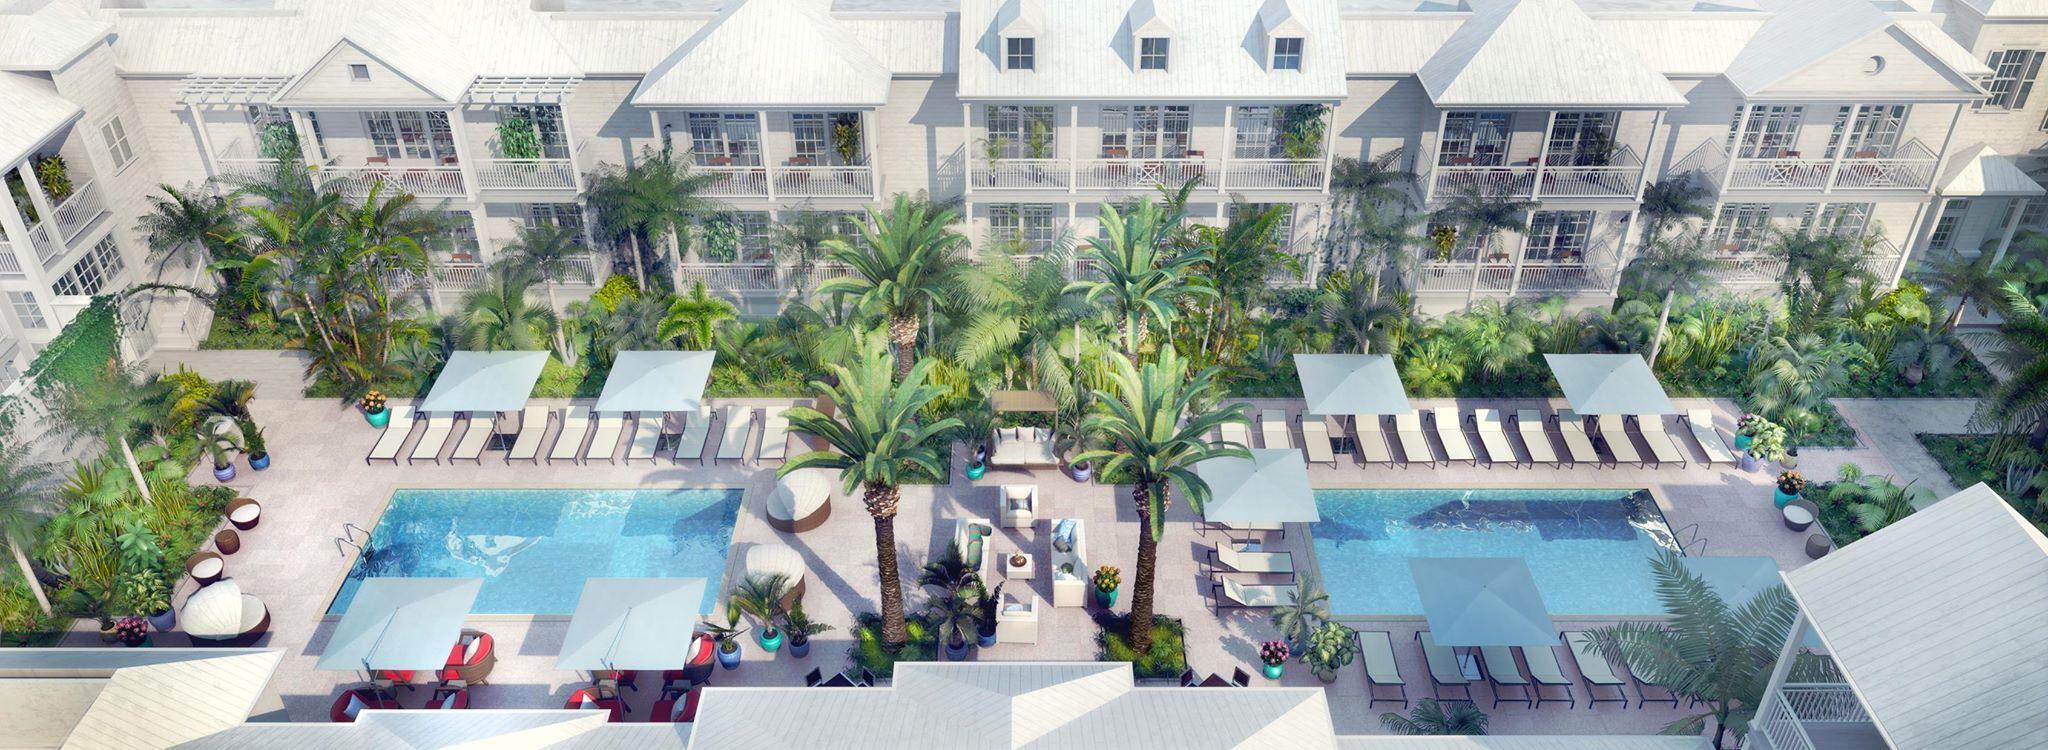 Florida Keys Hotel Rooms